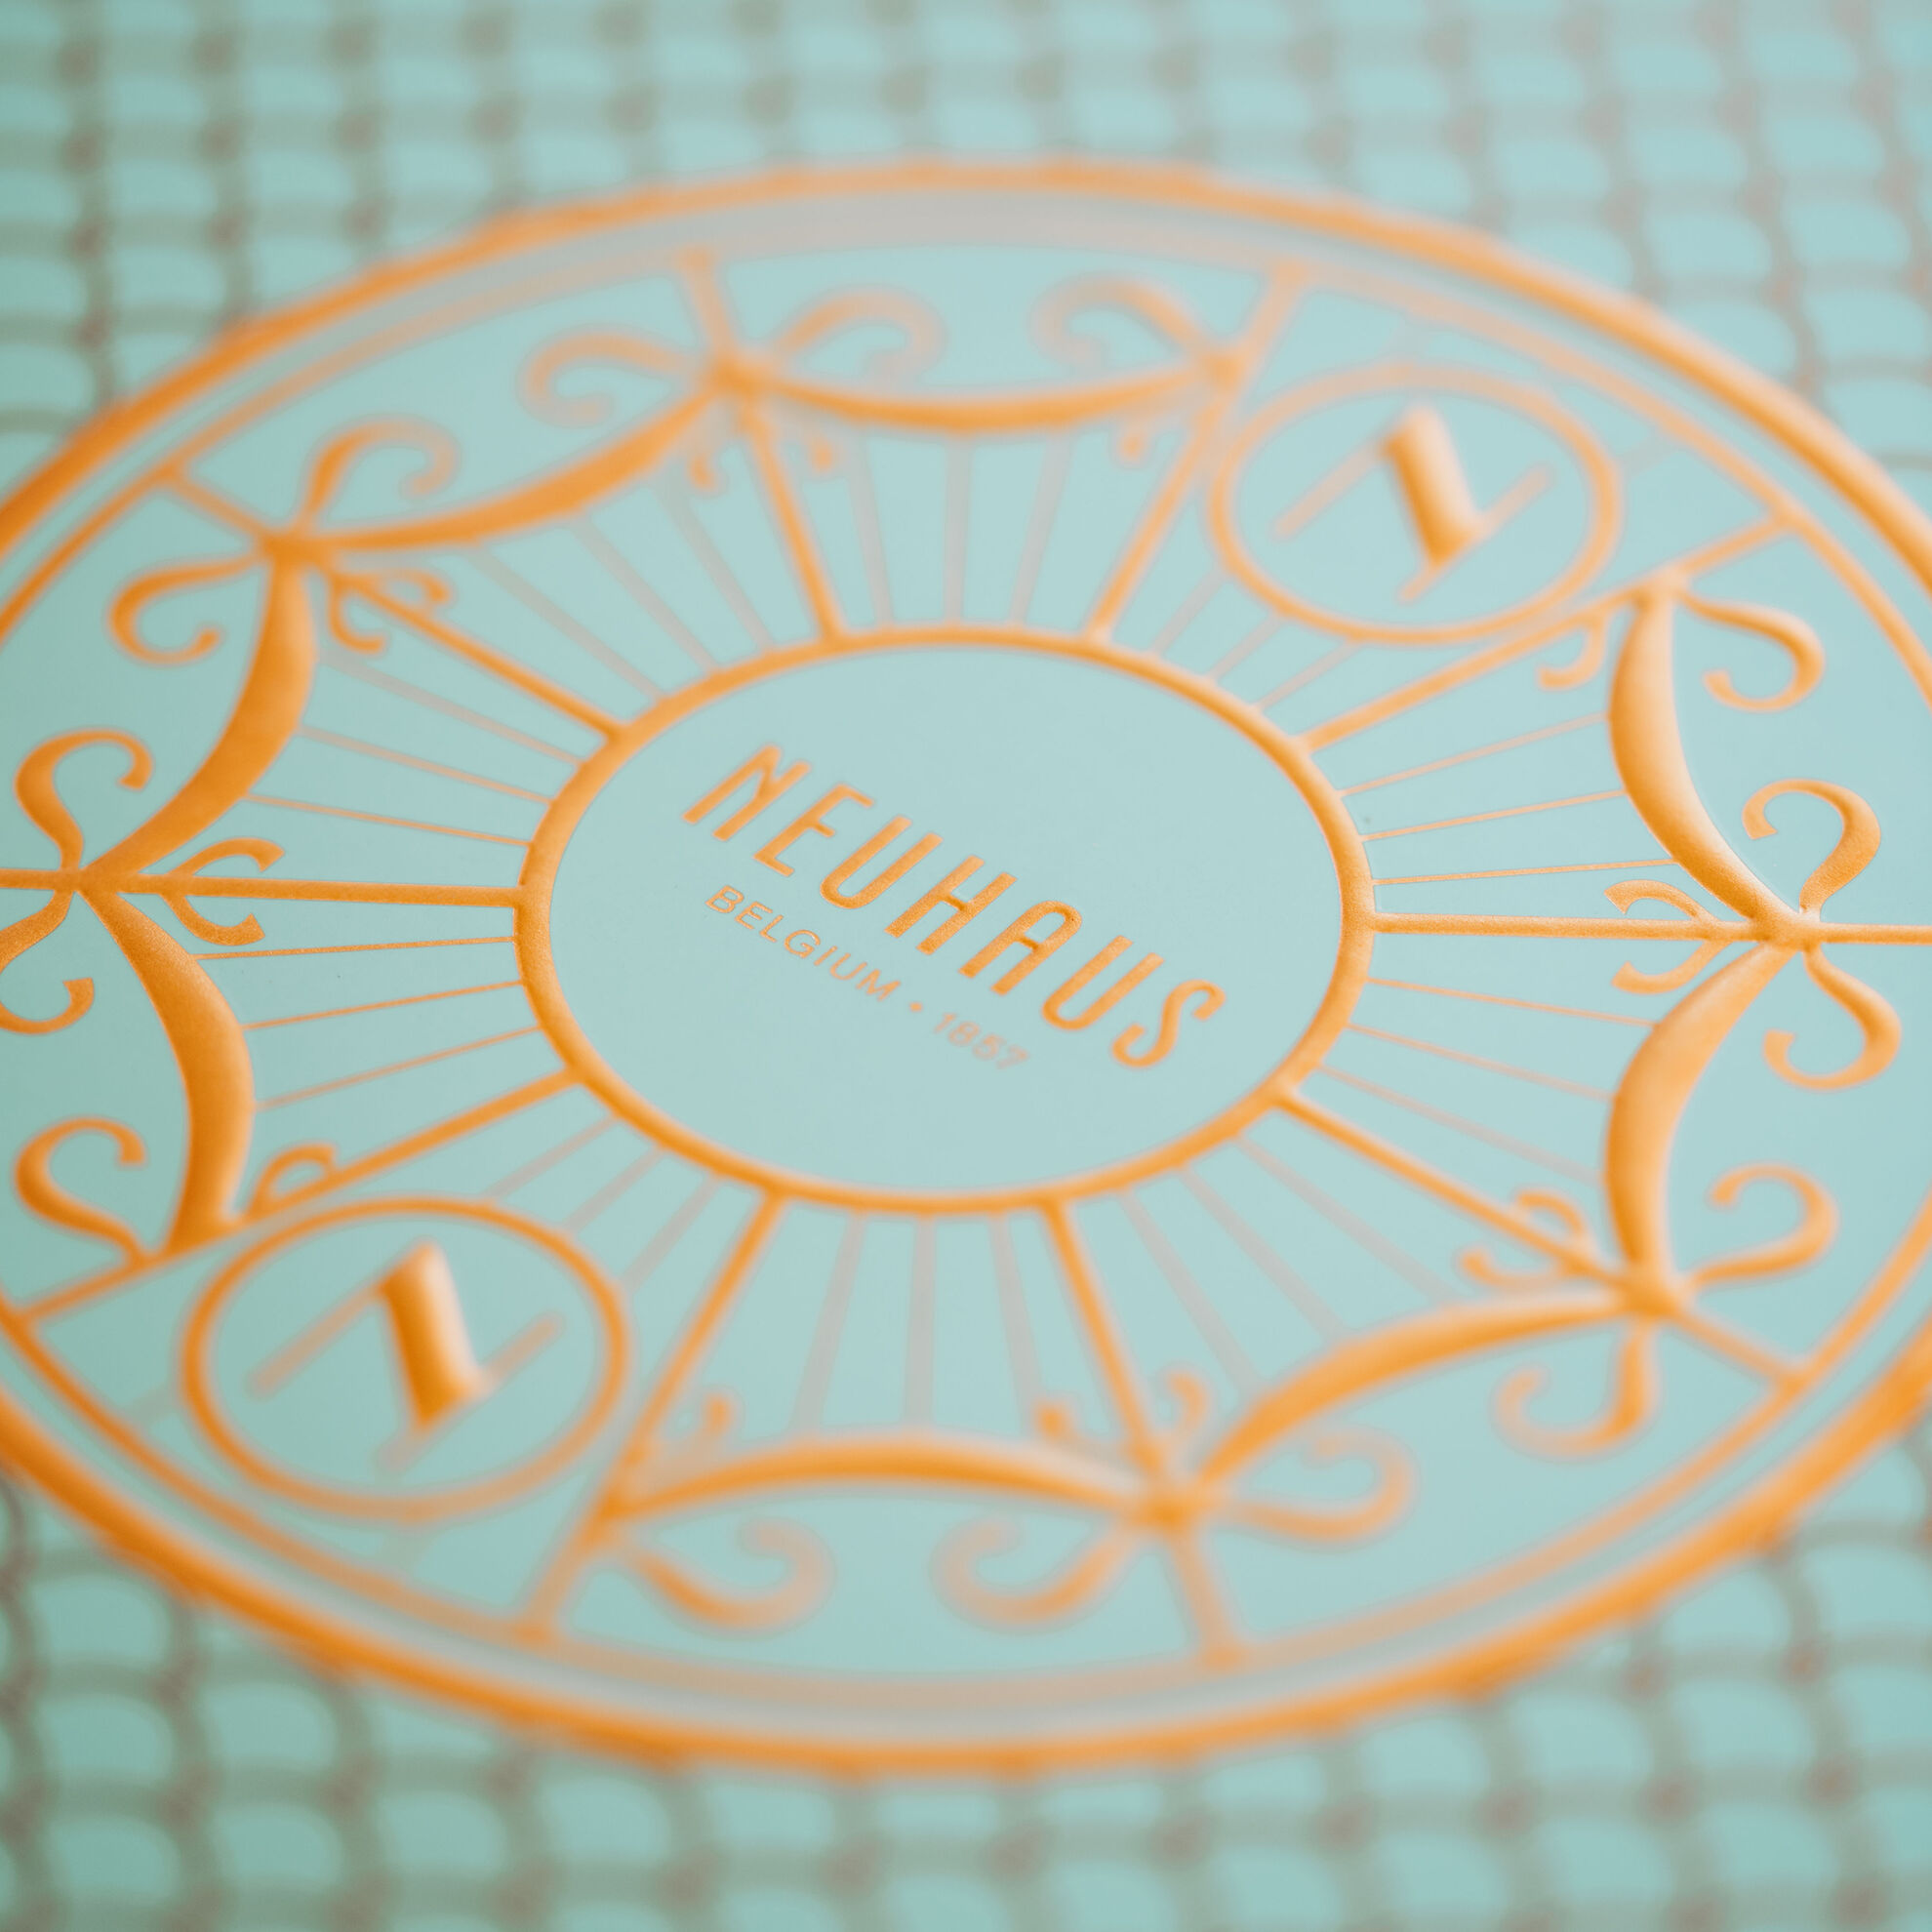 Neuhaus History Collection Box image number 41